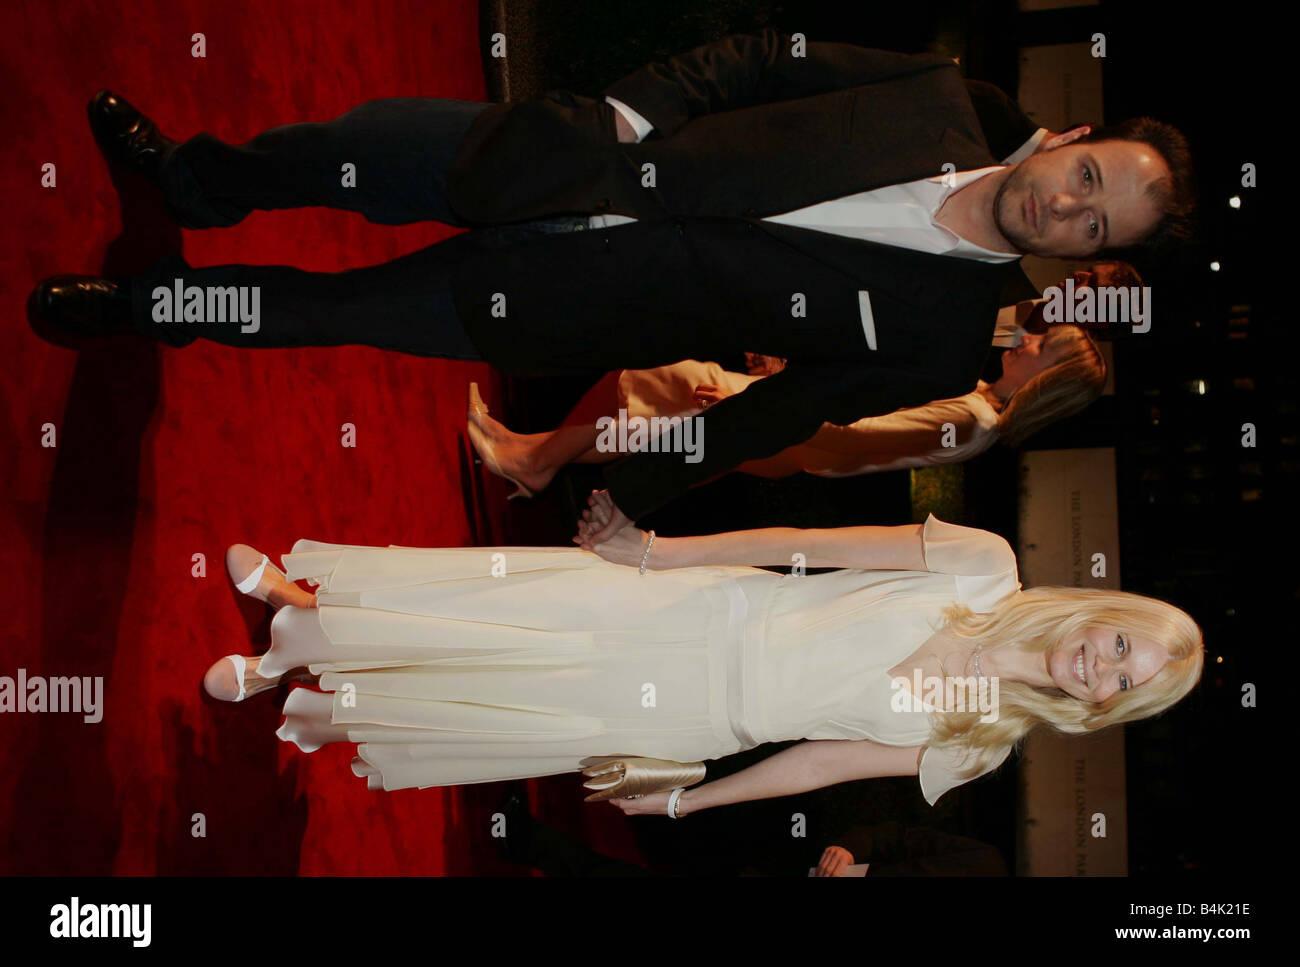 11 02 05 PRE BAFTA PARTY claudia schiffer PHOTO PHIL HARRIS MIRROR SHOWBIZ - Stock Image